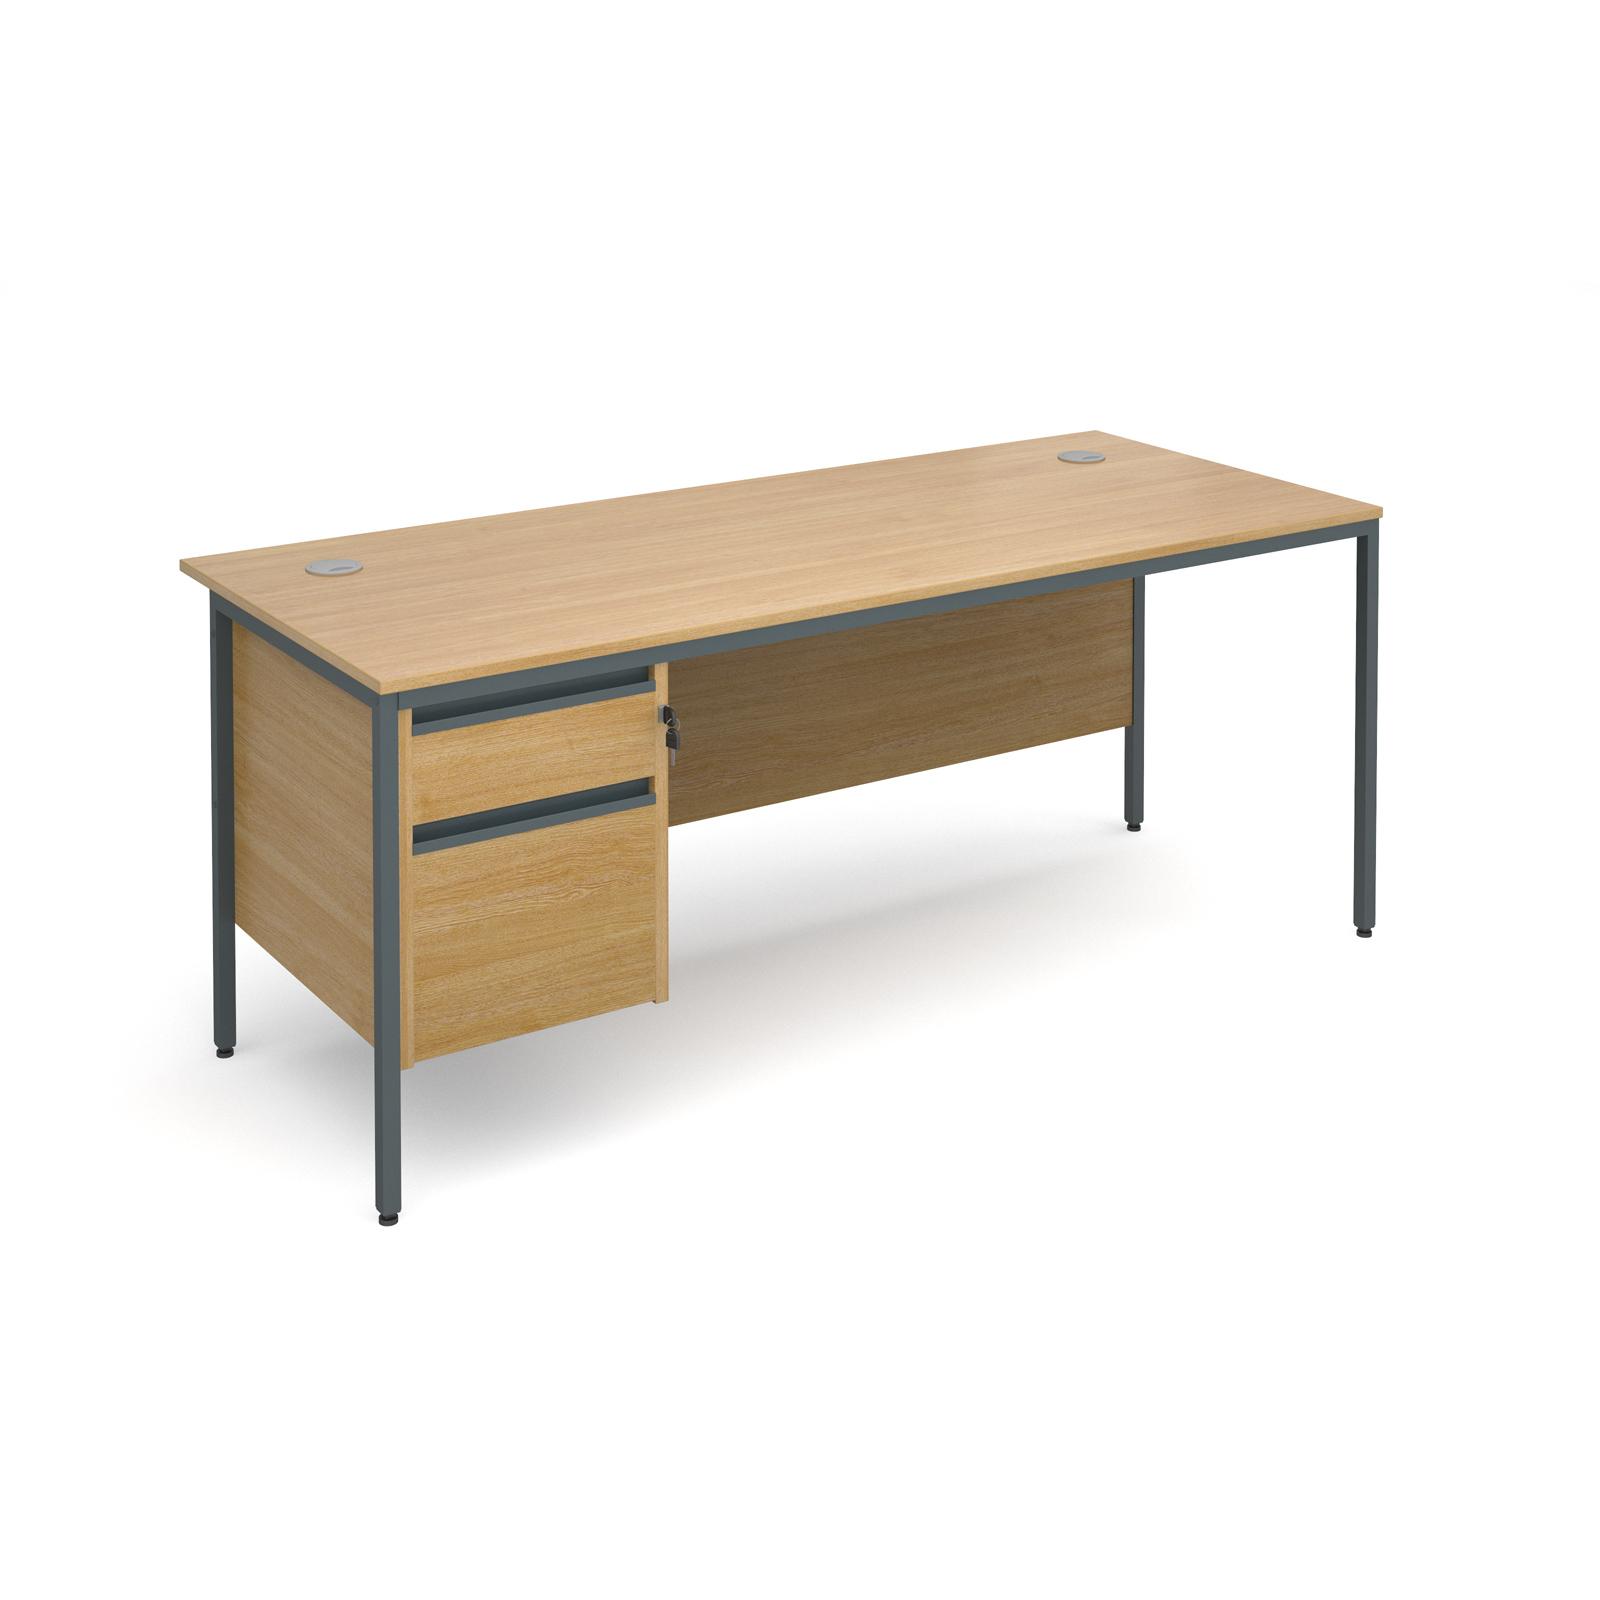 Maestro H frame straight desk with 2 drawer pedestal 1786mm - oak